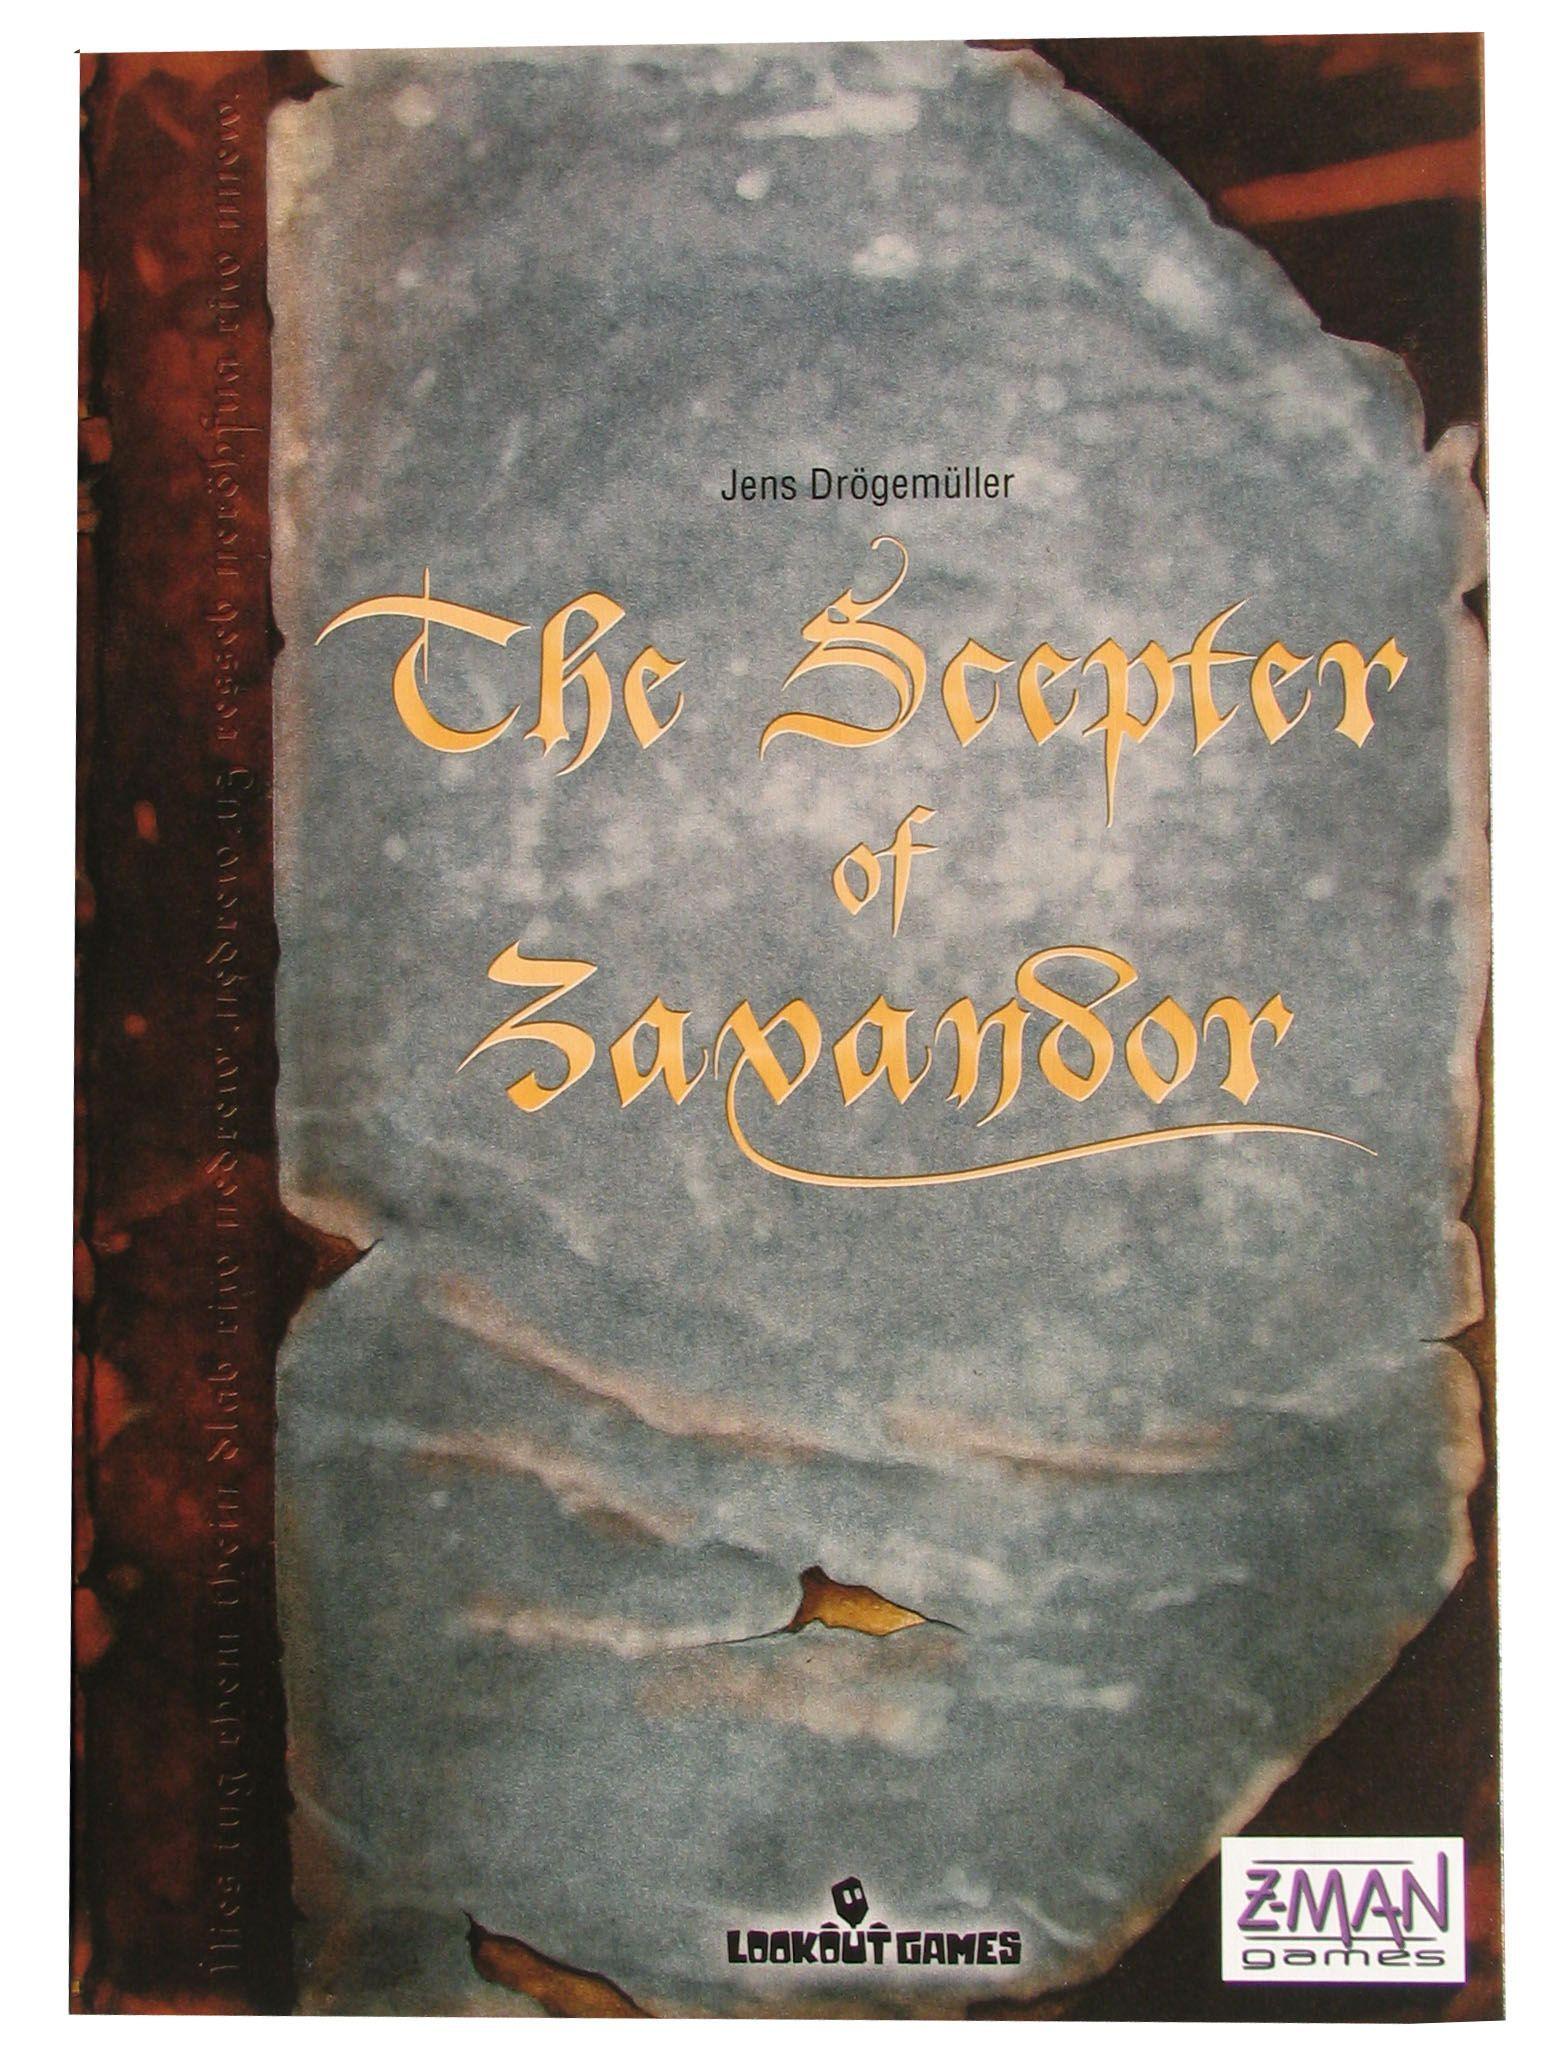 Main image for The Scepter of Zavandor